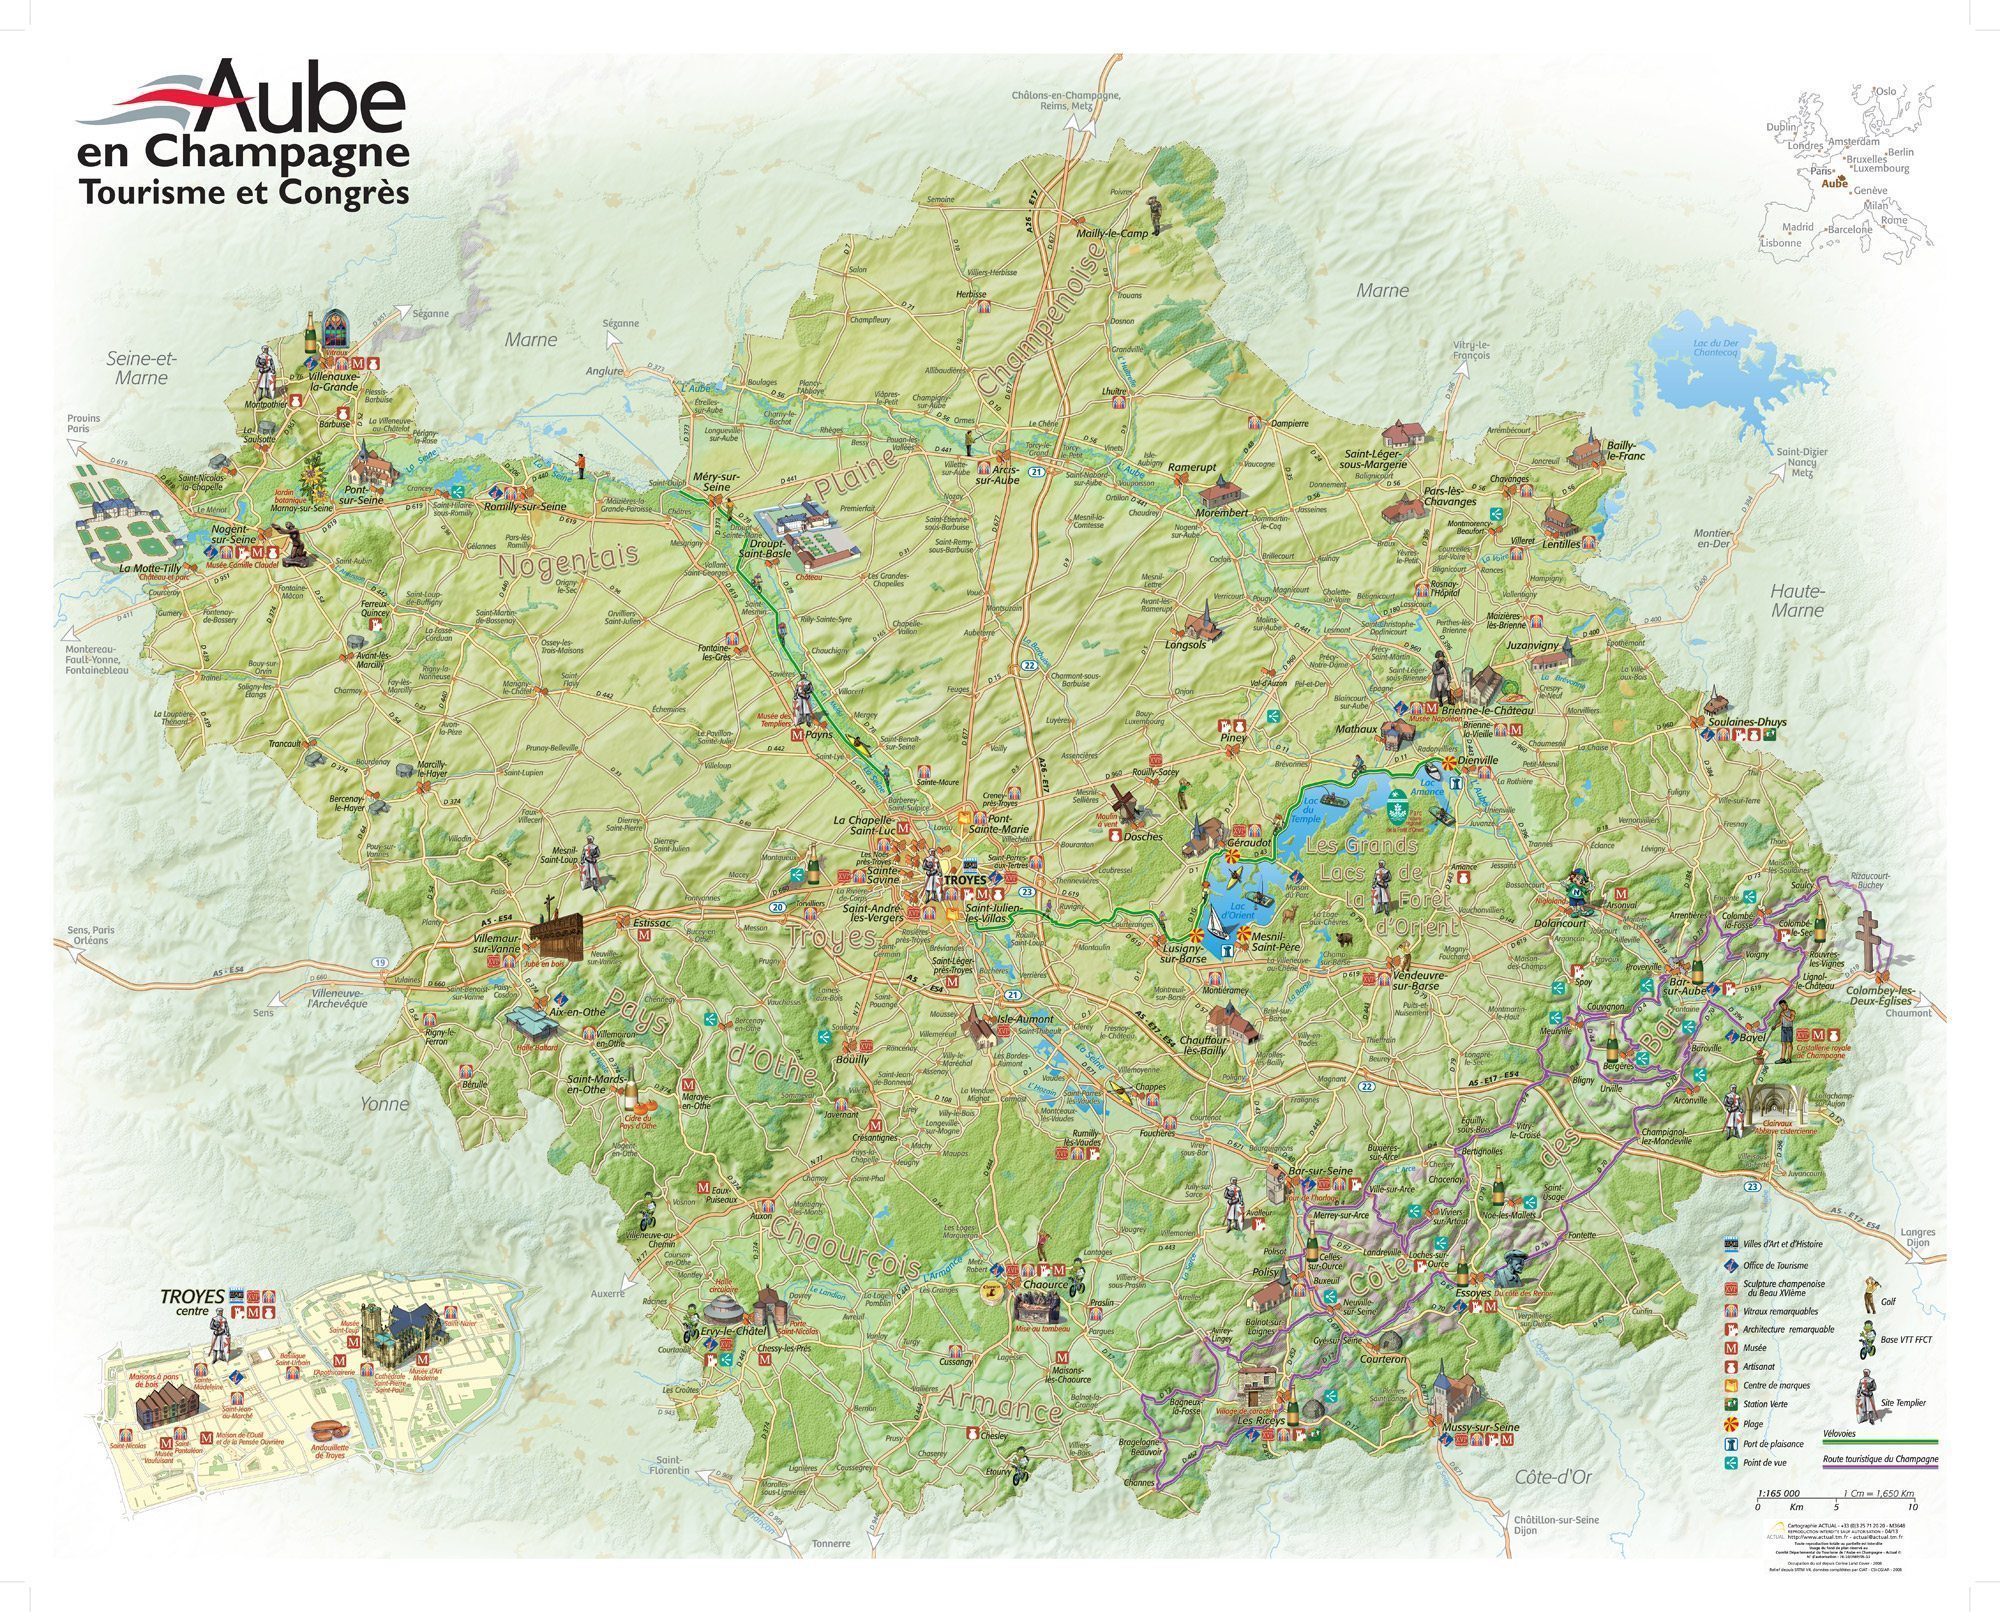 Touristic map <br> of Aube en Champagne